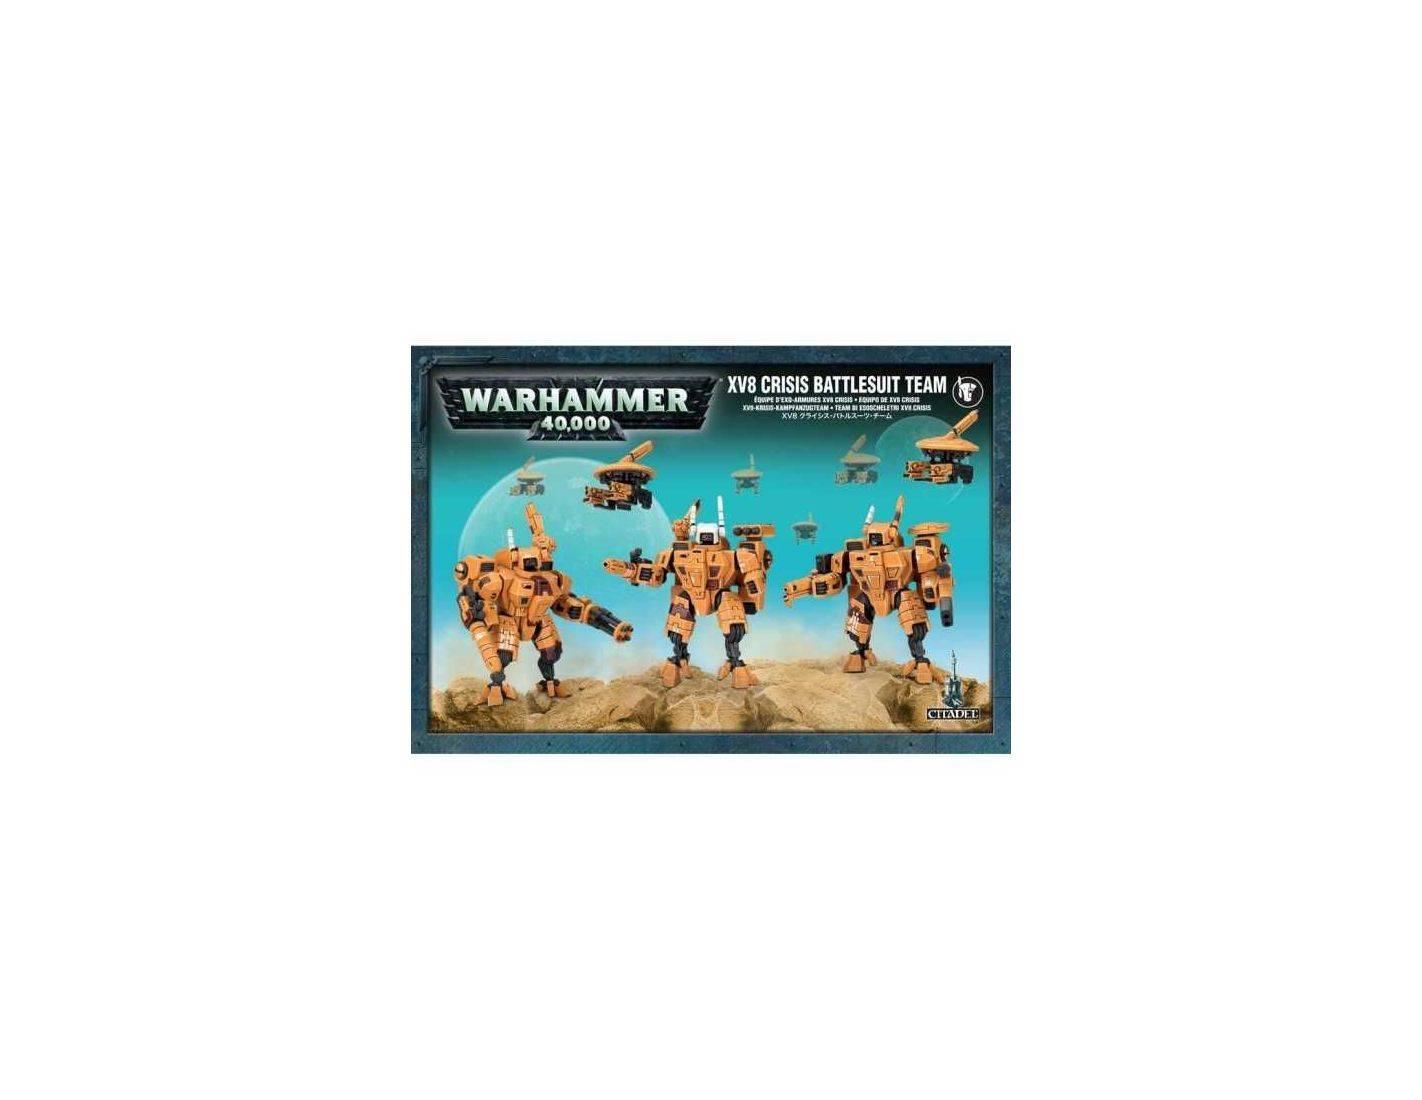 Games Workshop Warhammer 56-07 TEAM DI ESOSCHELETRI XV8 CRISIS Workshop Modellino